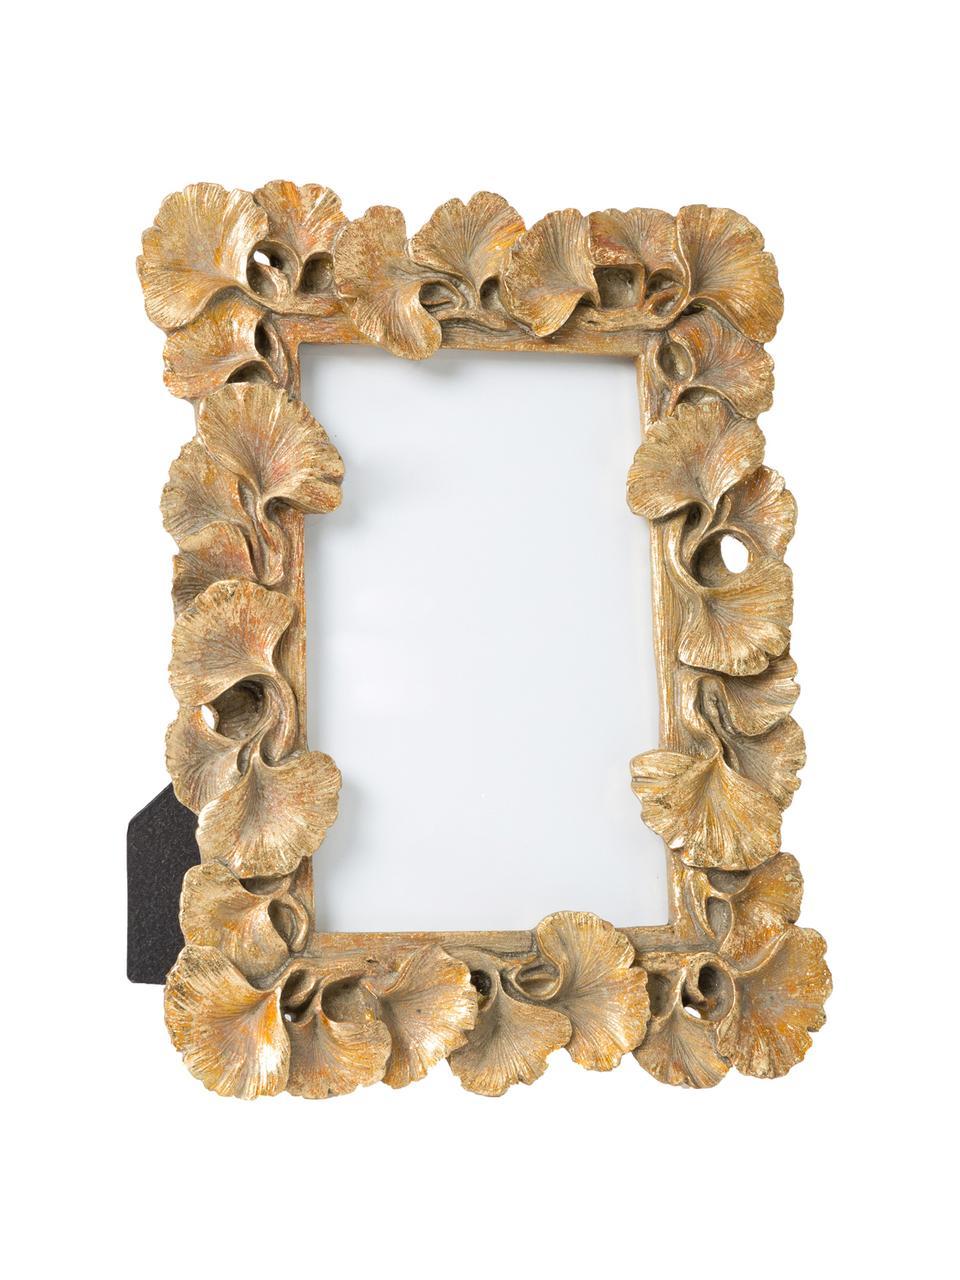 Bilderrahmen Macky, Rahmen: Polyresin, Front: Glas, Rückseite: Karton, Metall, lackiert, Goldfarben, 13 x 18 cm